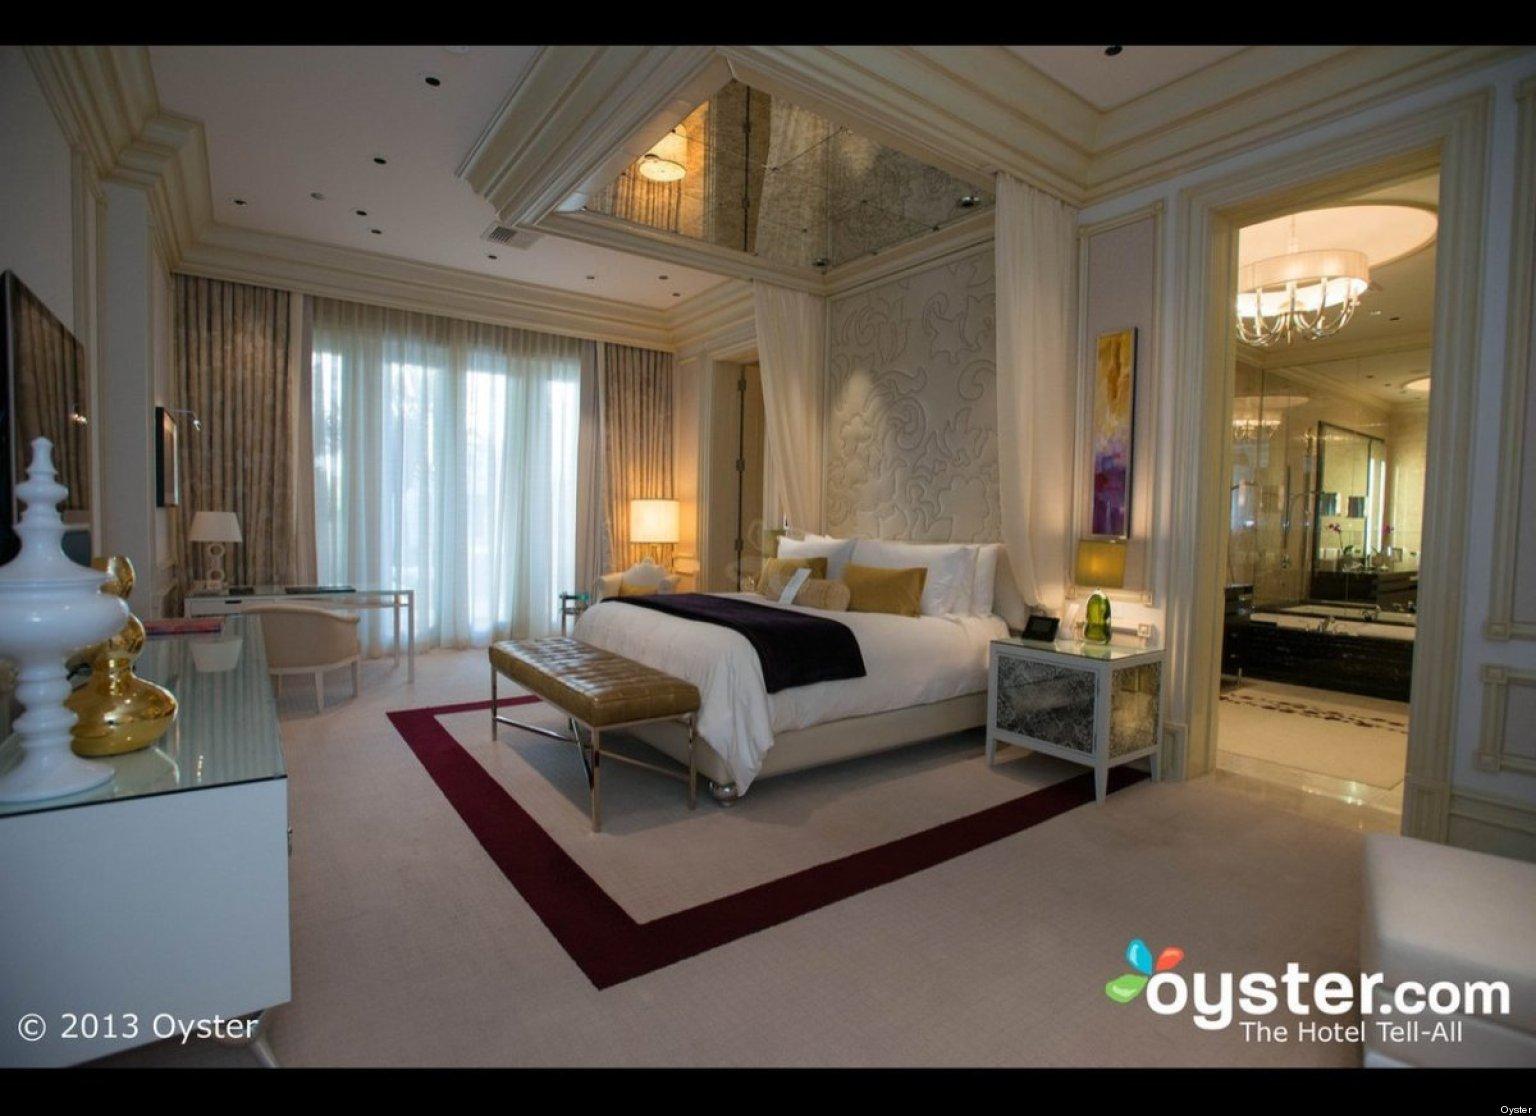 Sticker Shock 12 Crazy Expensive Hotel Suites Photos